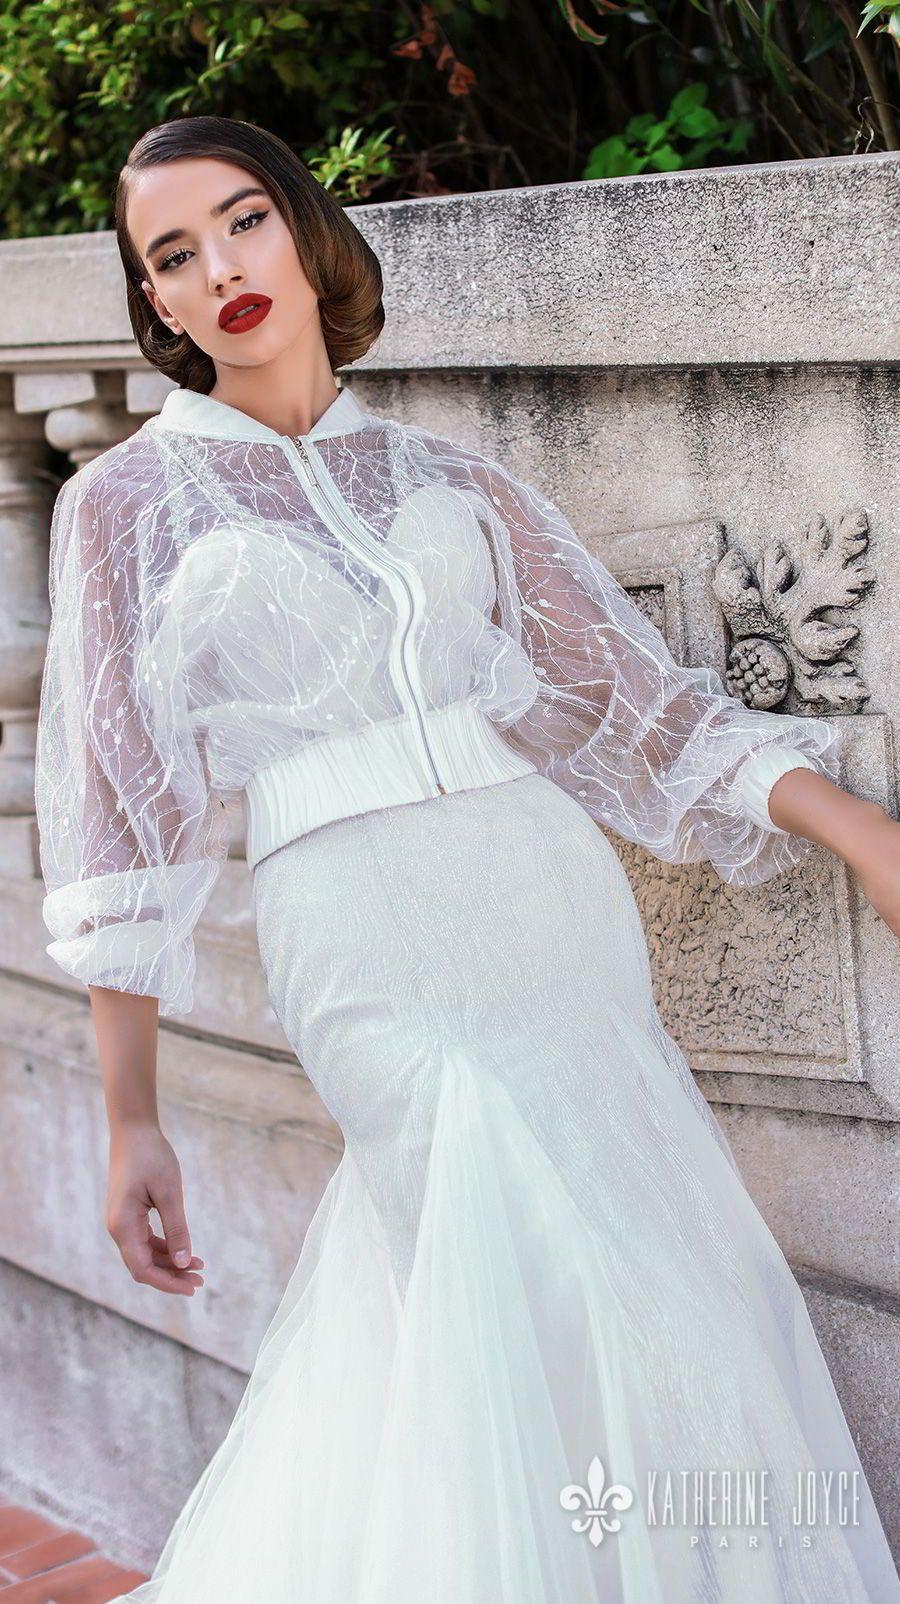 Katherine Joyce 2018 Brautkleider | HochzeitKleid | Pinterest ...